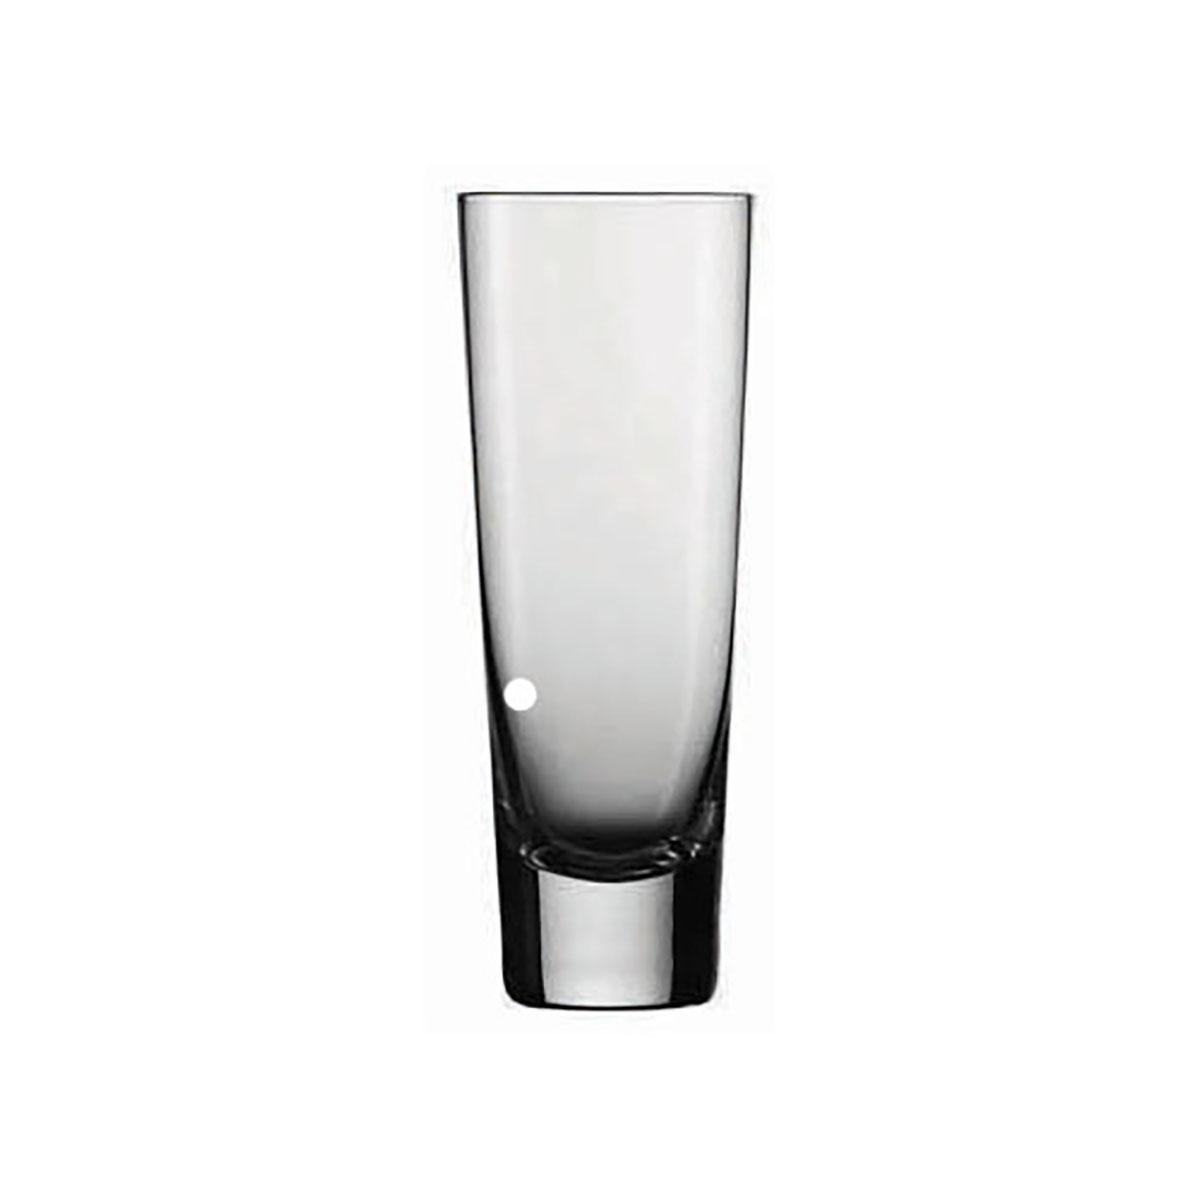 Schott Zwiesel Tritan Tossa Iced Beverage, Set of Six